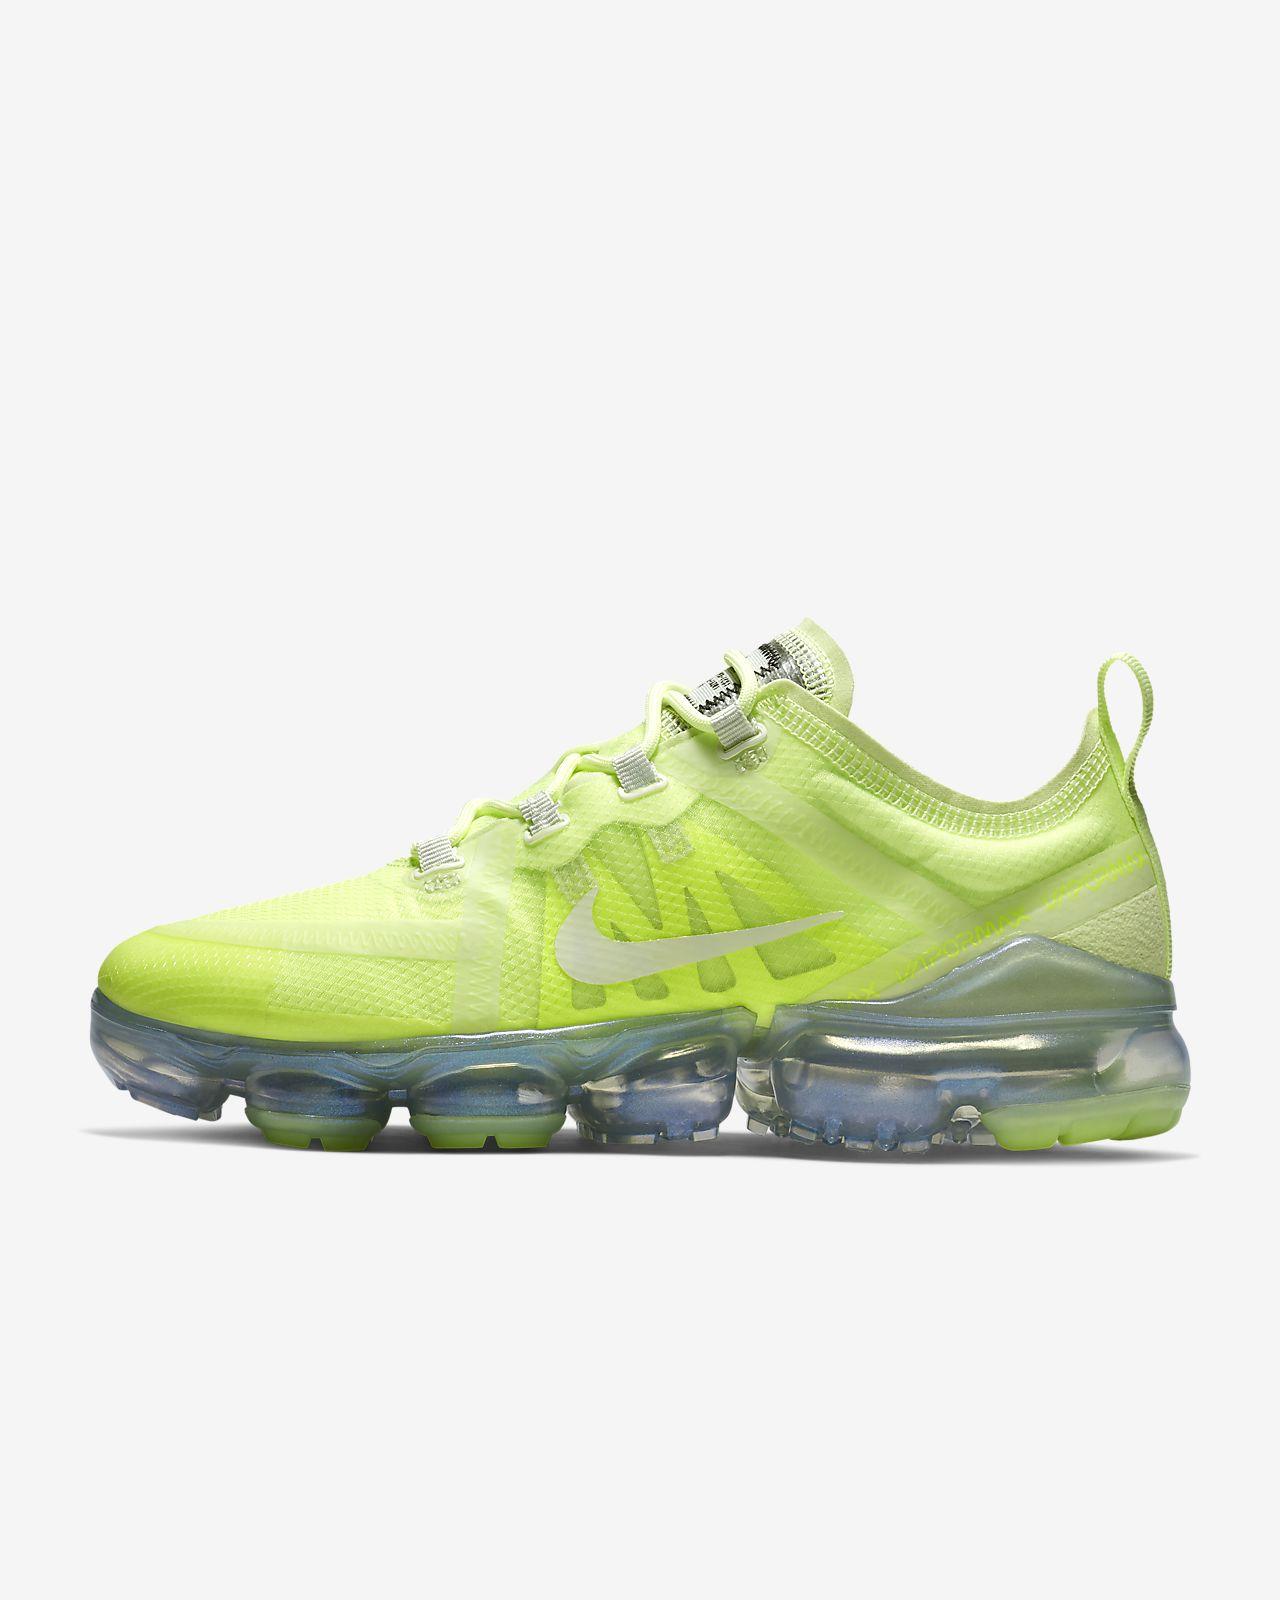 81973c45e4 Calzado para mujer Nike Air VaporMax 2019. PR nike air vapormax 2019 id